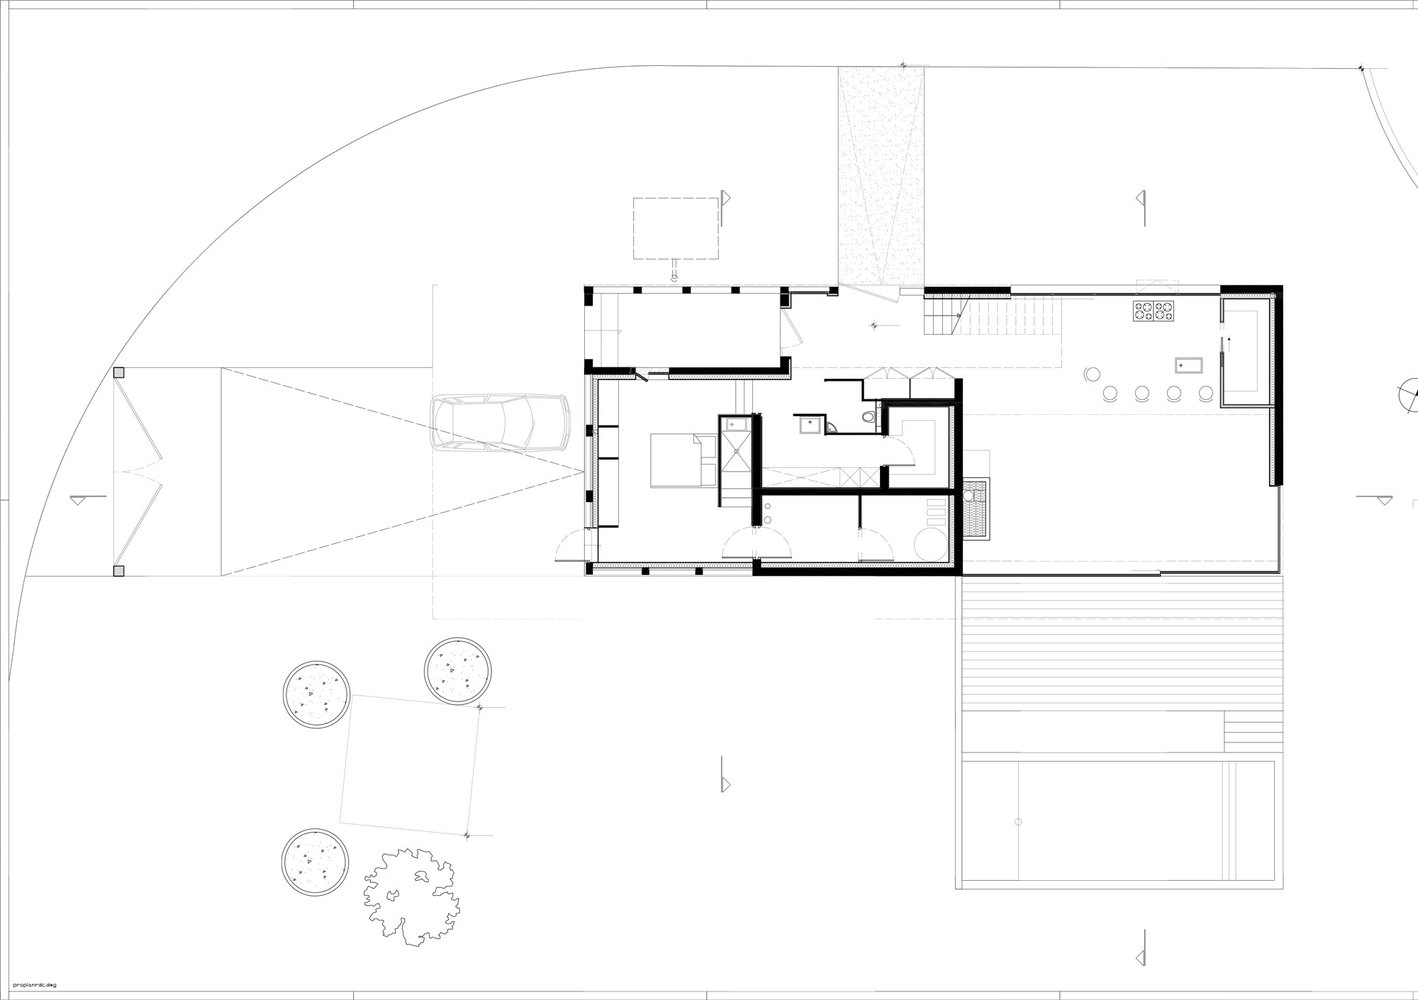 medium resolution of chipster blister house ground floor plan